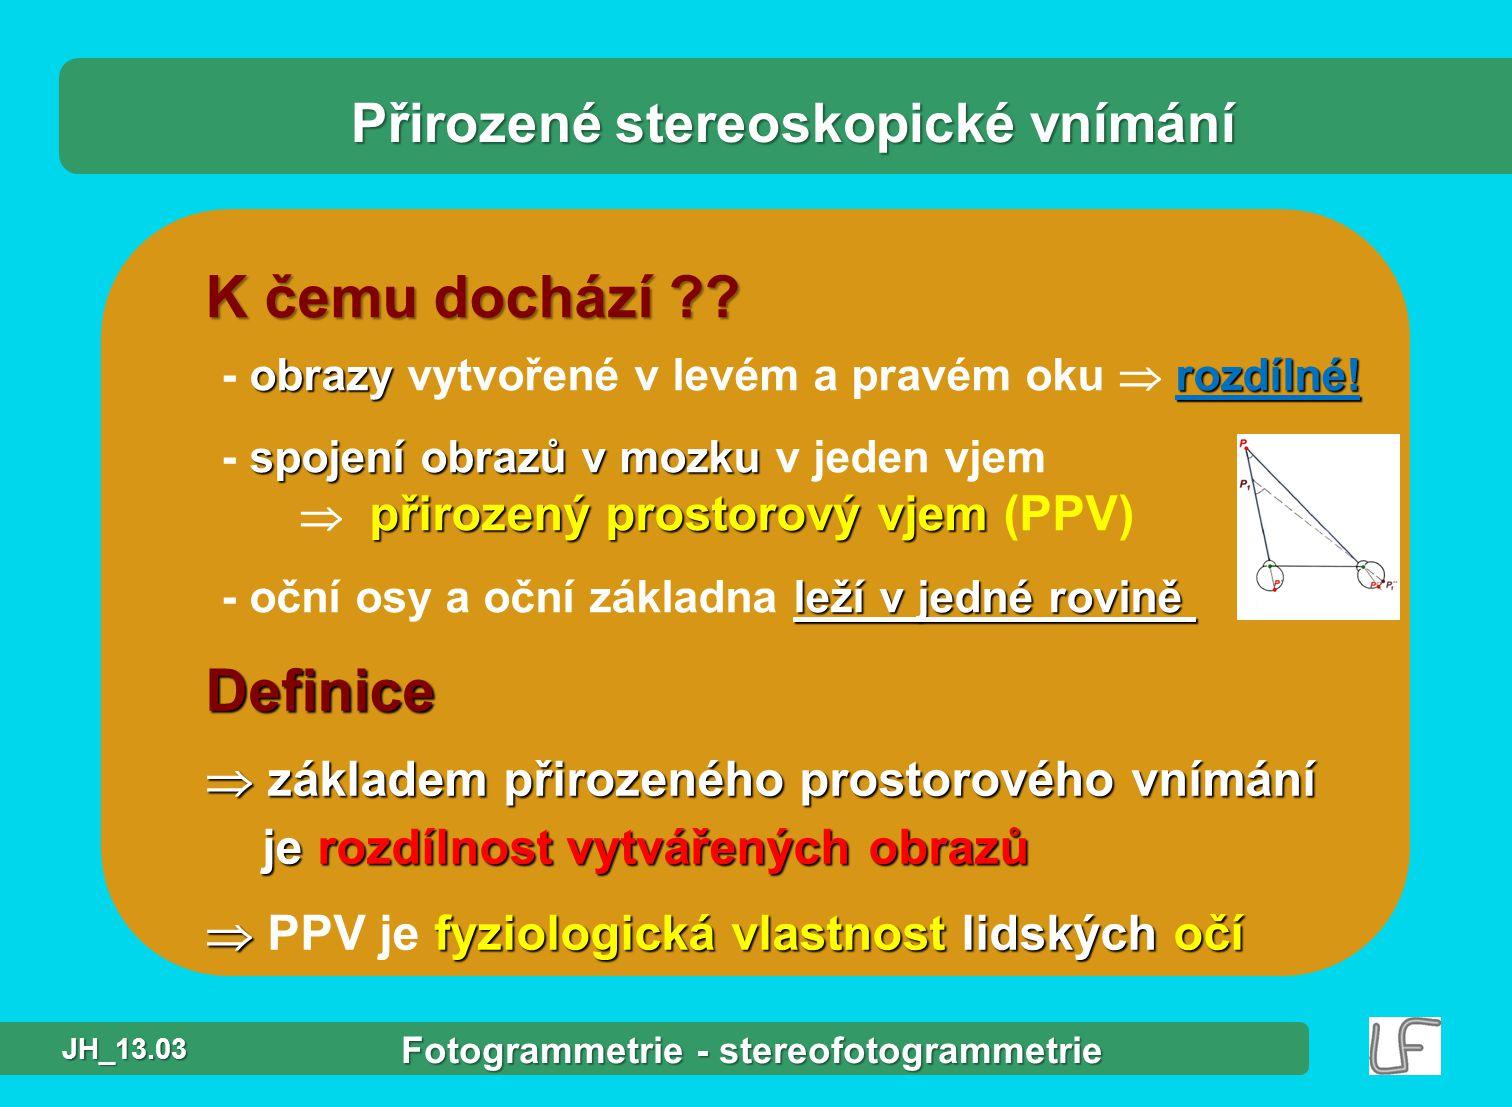 Fotogrammetrie a DPZ úvod Program přednášky,, Stereofotogrammetrie stereoskopie stereoskopie normální případ stereofotogrammetrie normální případ stereofotogrammetrie stereovyhodnocení stereovyhodnocení